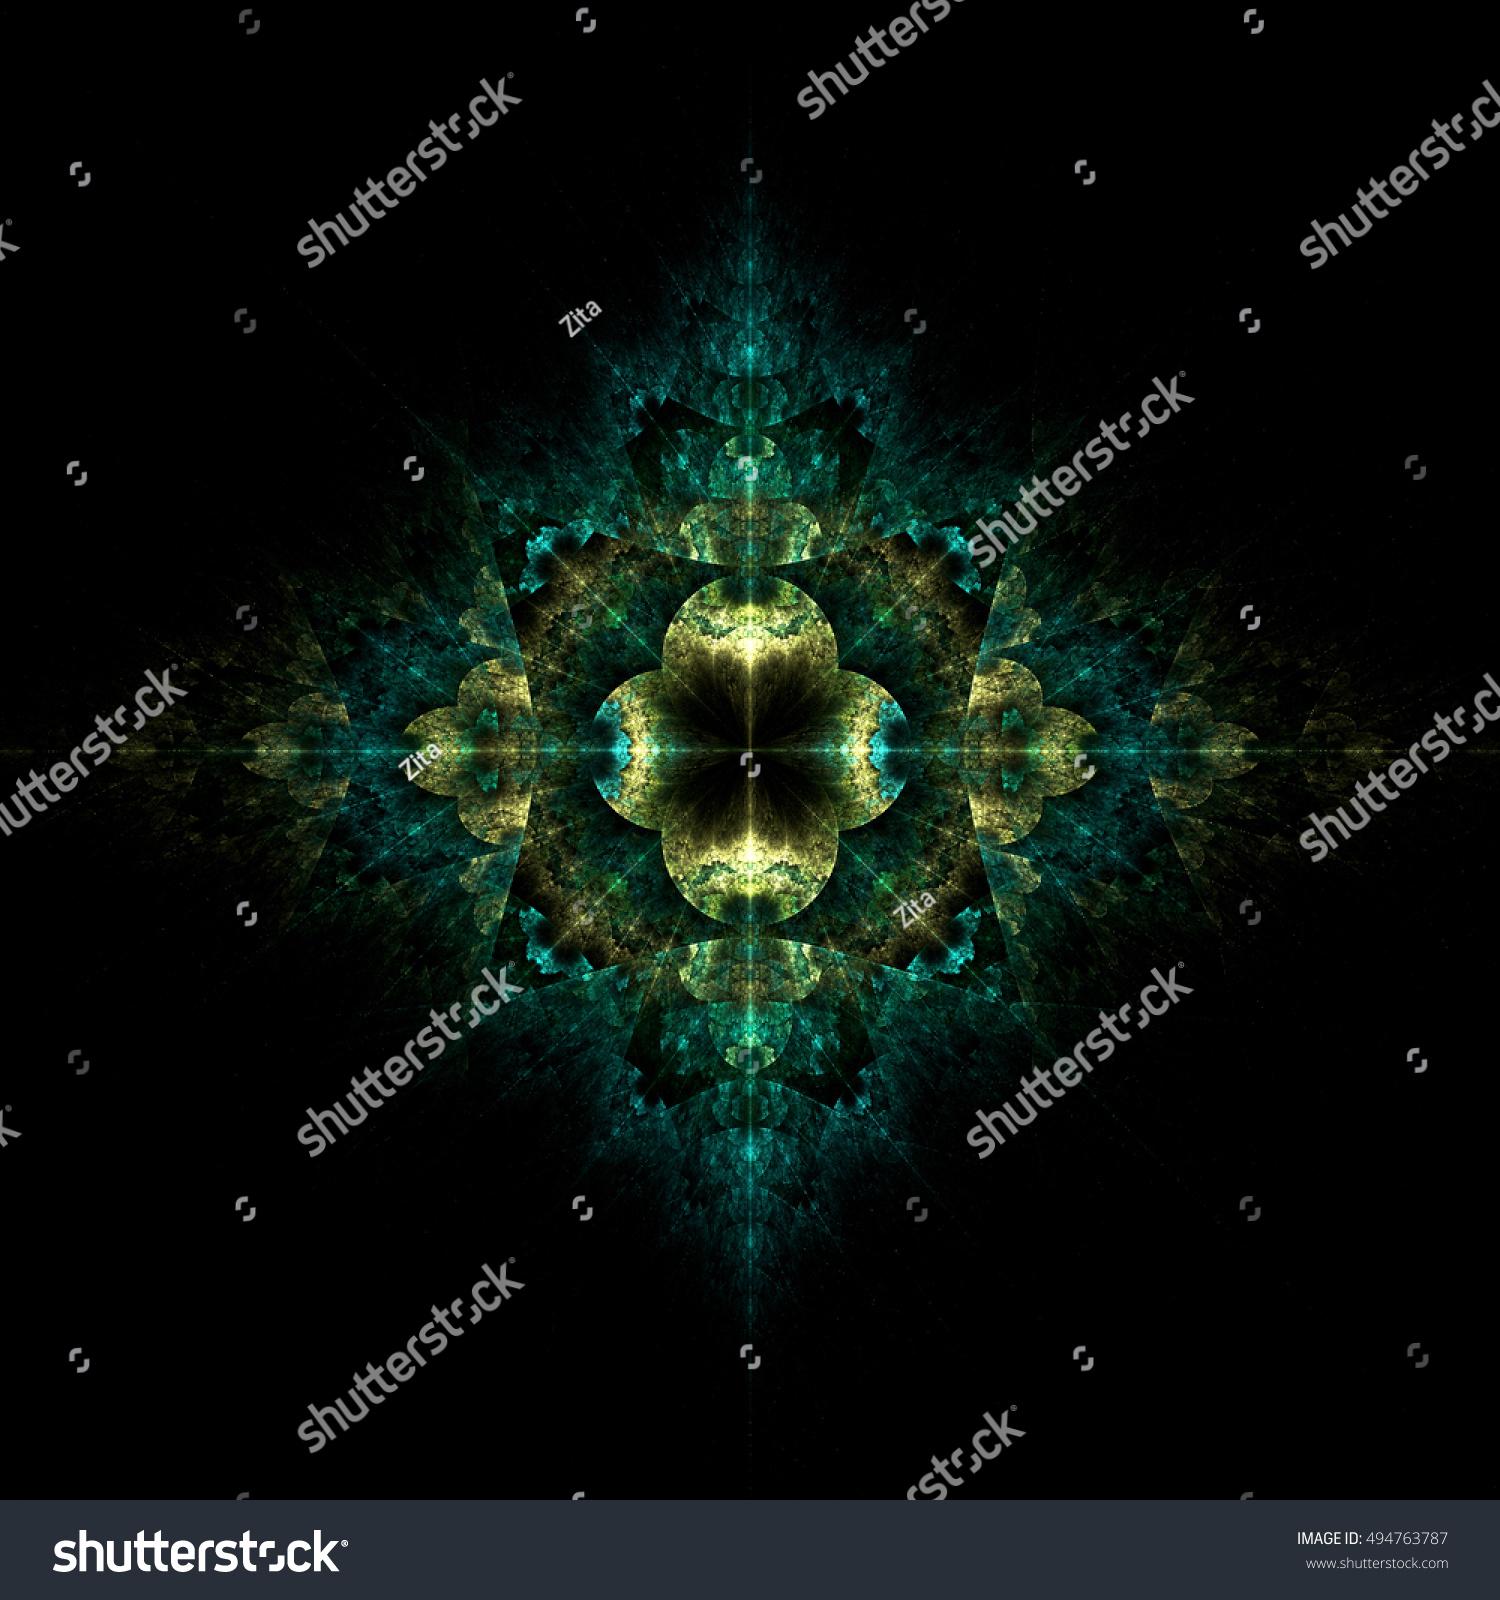 Elegant fractal background photo